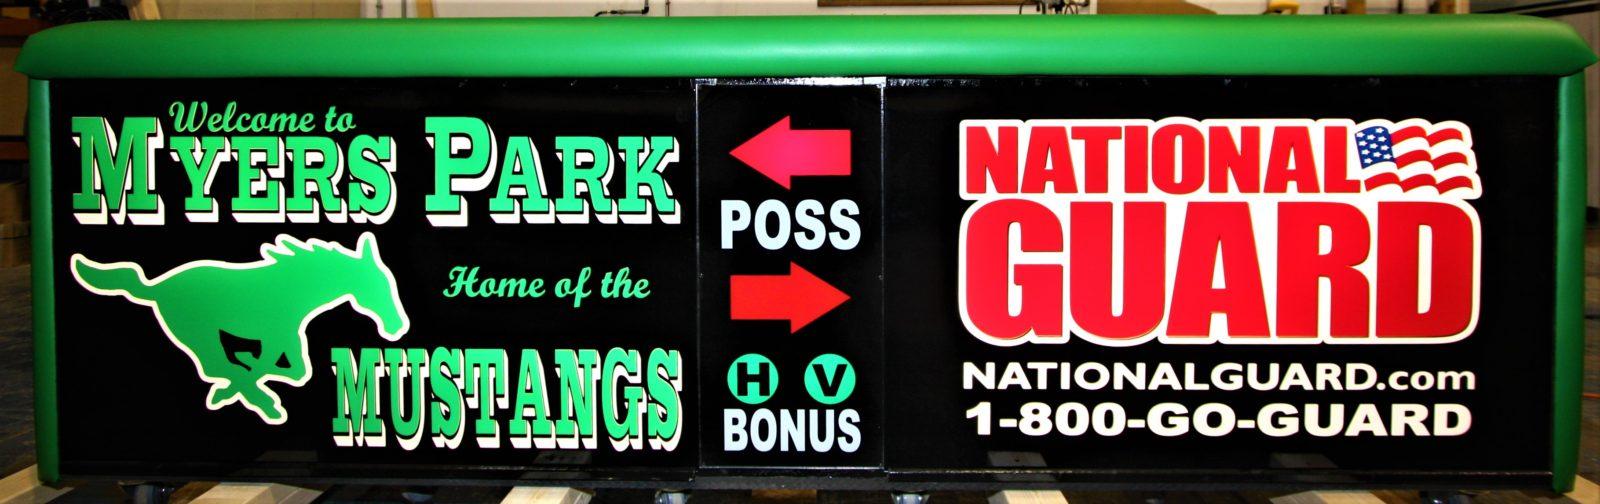 Meyers Park high school scoring table North Carolina Army National Guard NCARNG